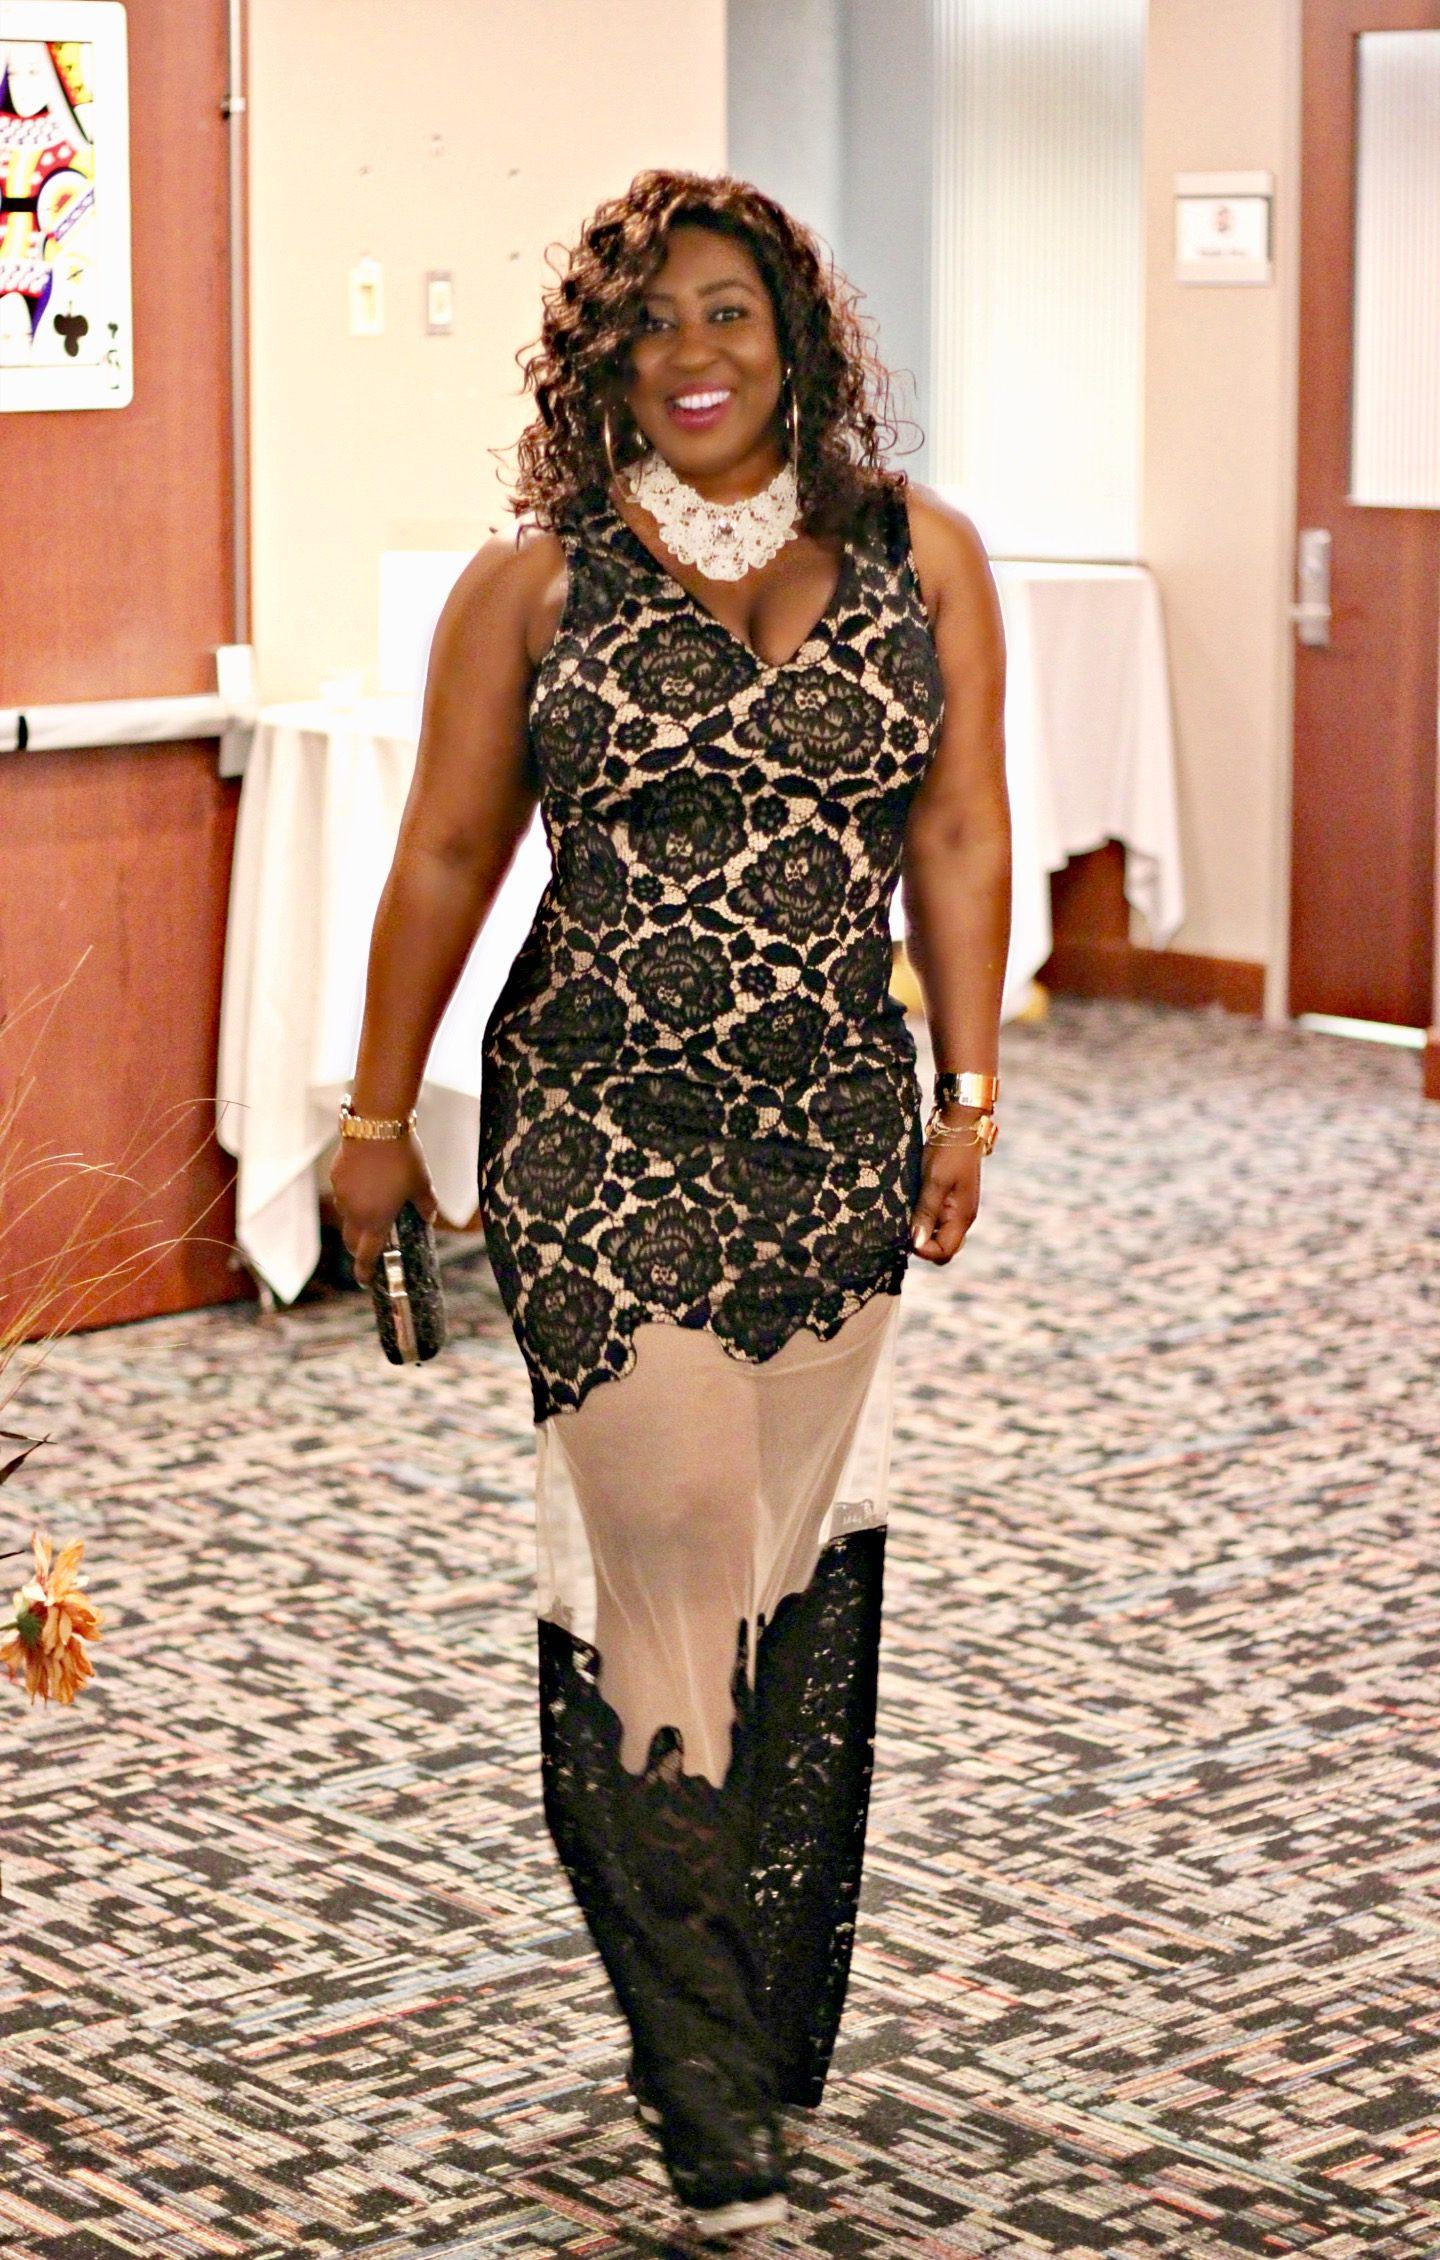 formal-wedding-gueset-lace-maxi-dress